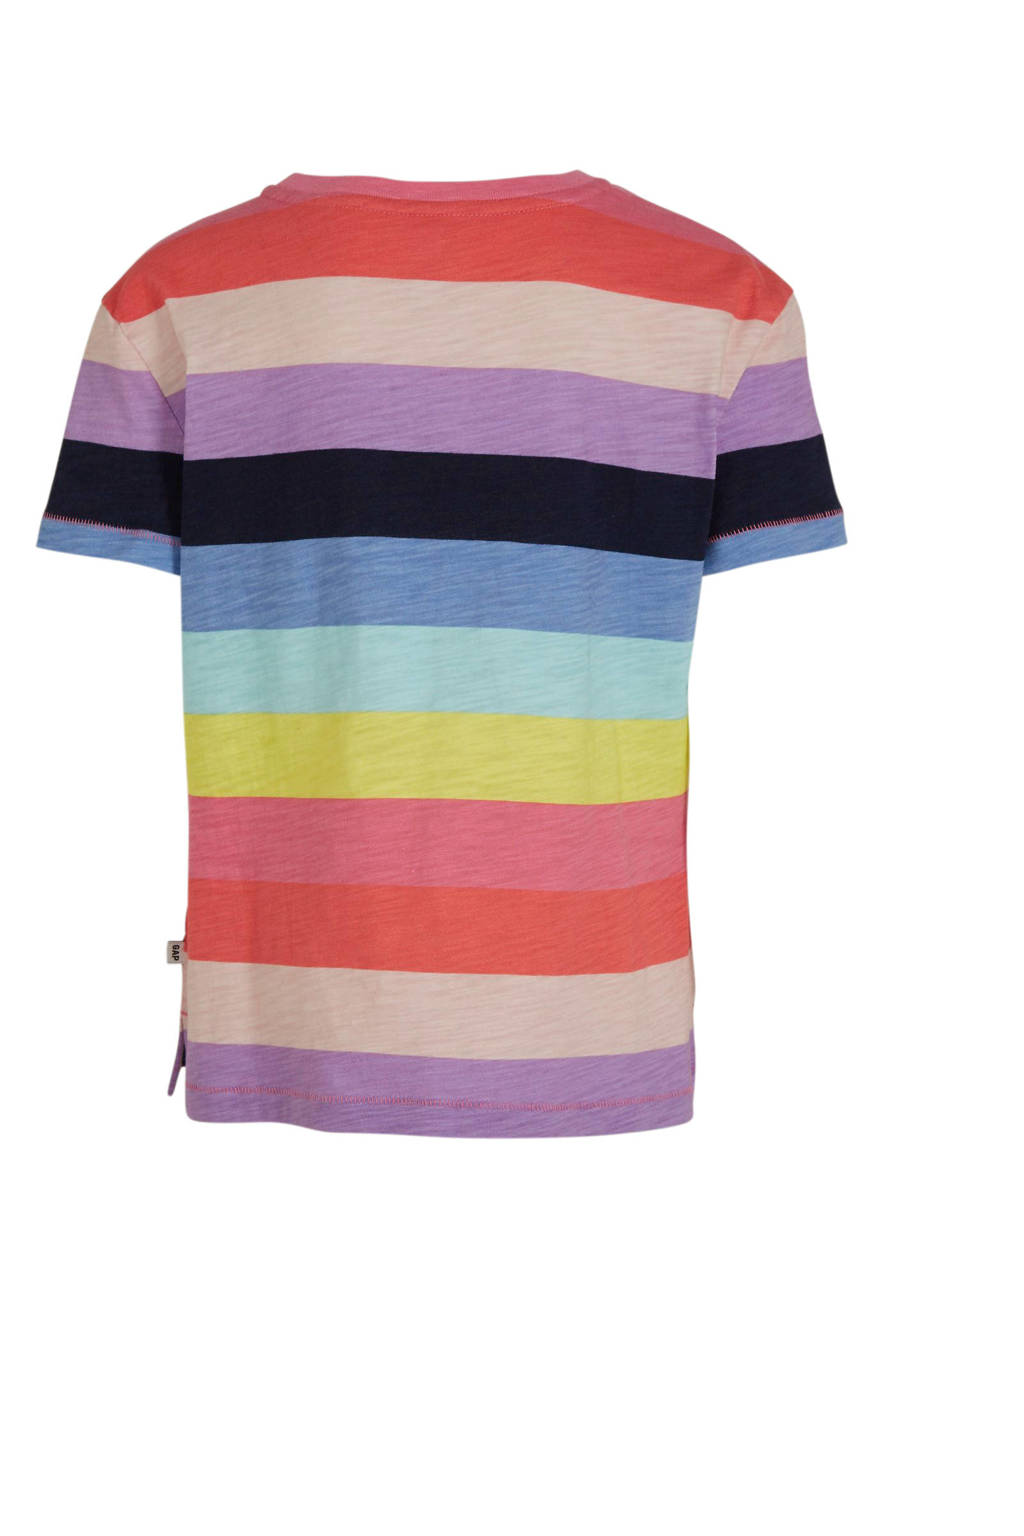 GAP gestreept T-shirt roze/multicolor